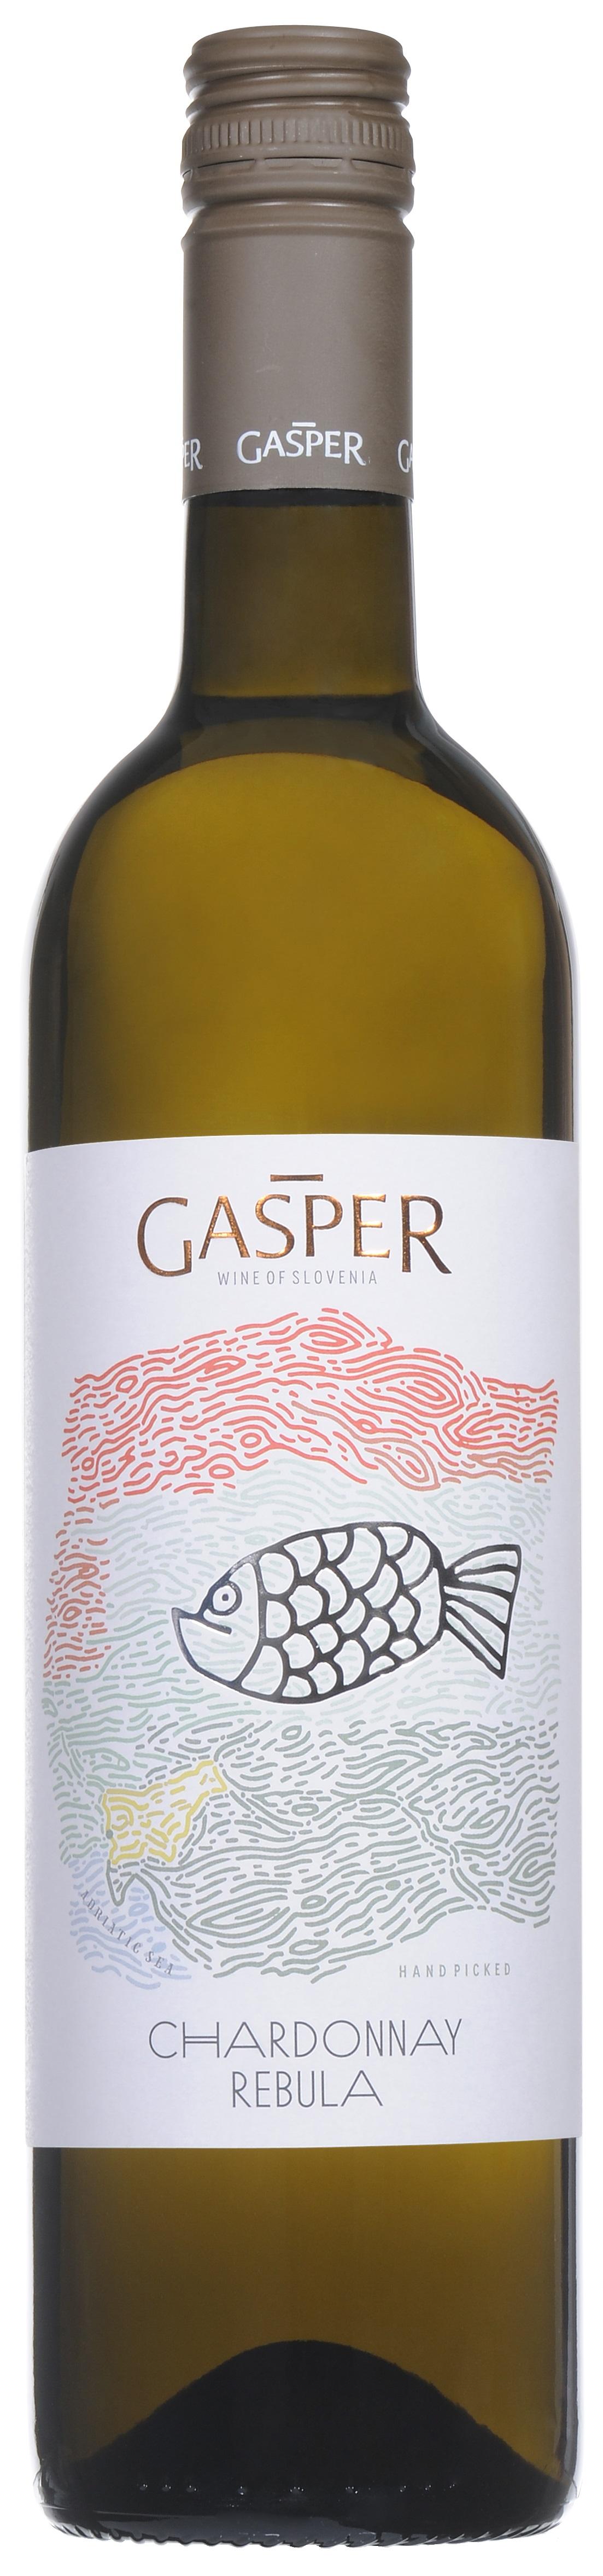 Gasper, Chardonnay/Rebula 2016